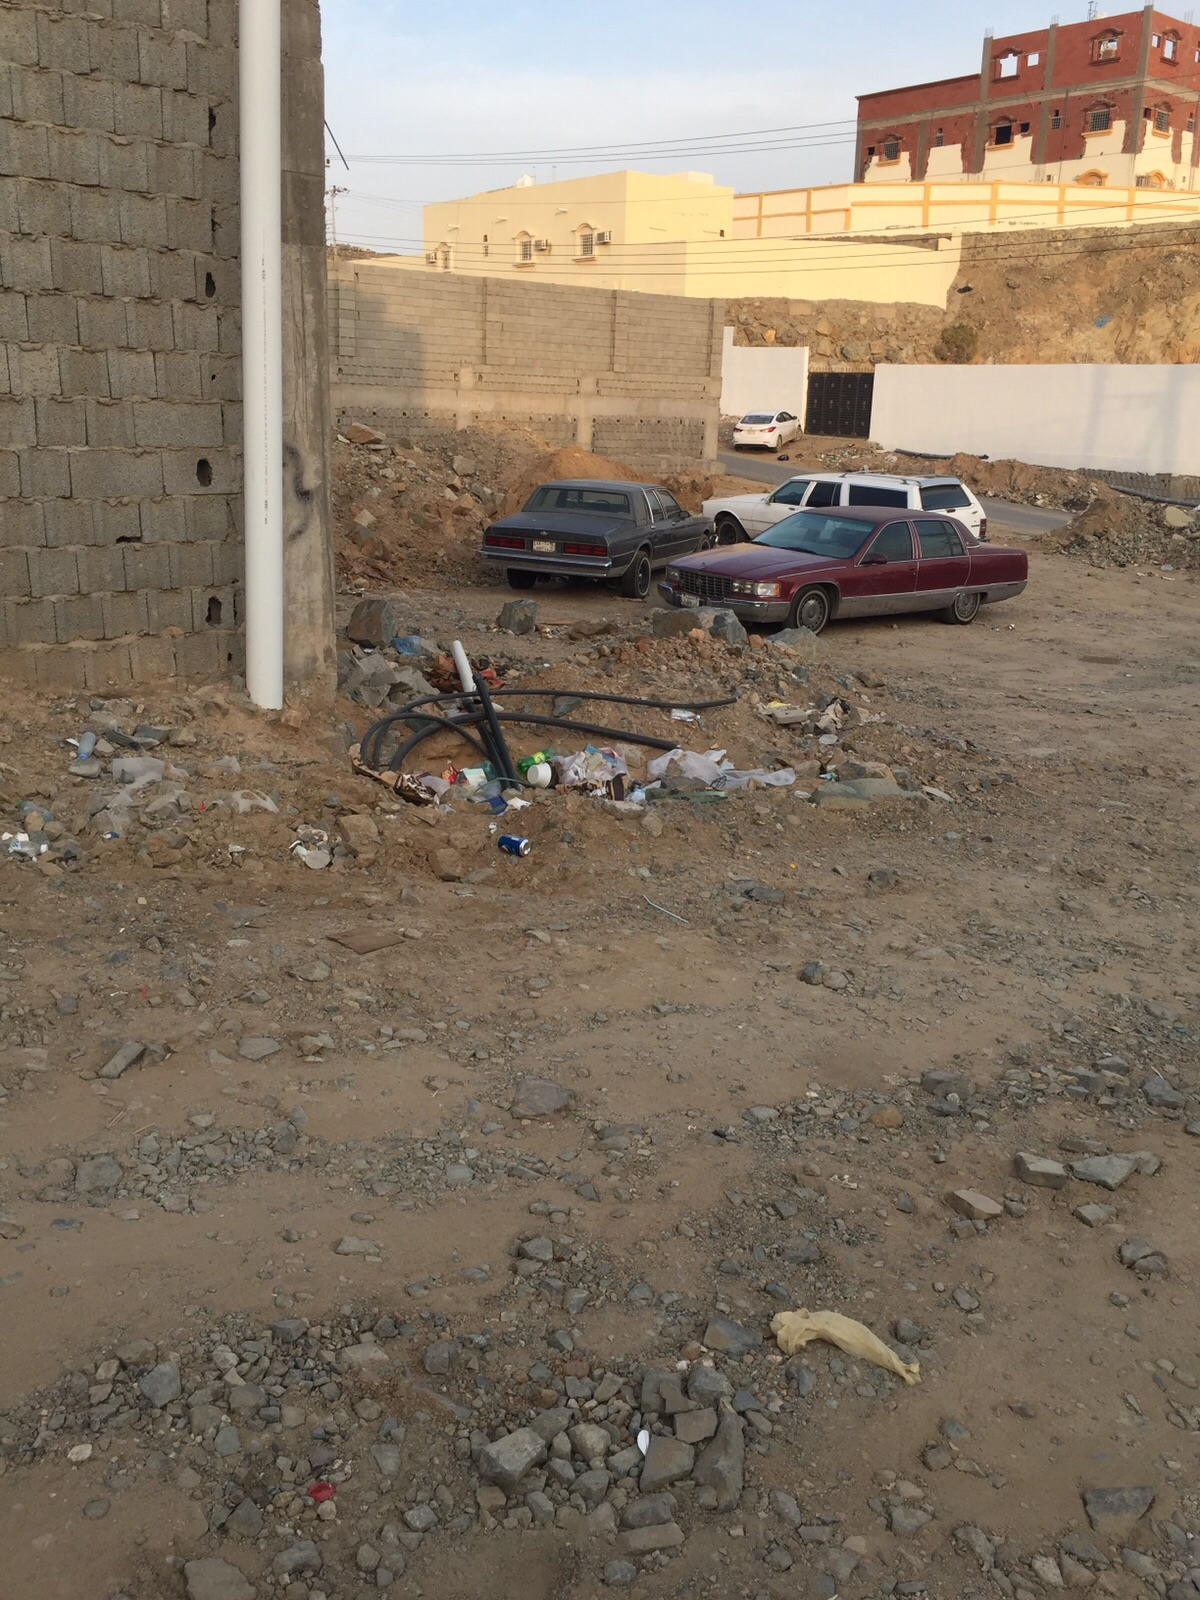 كيبل كهربائي مشكوف بحي كيلو14 شمال جدة (3)